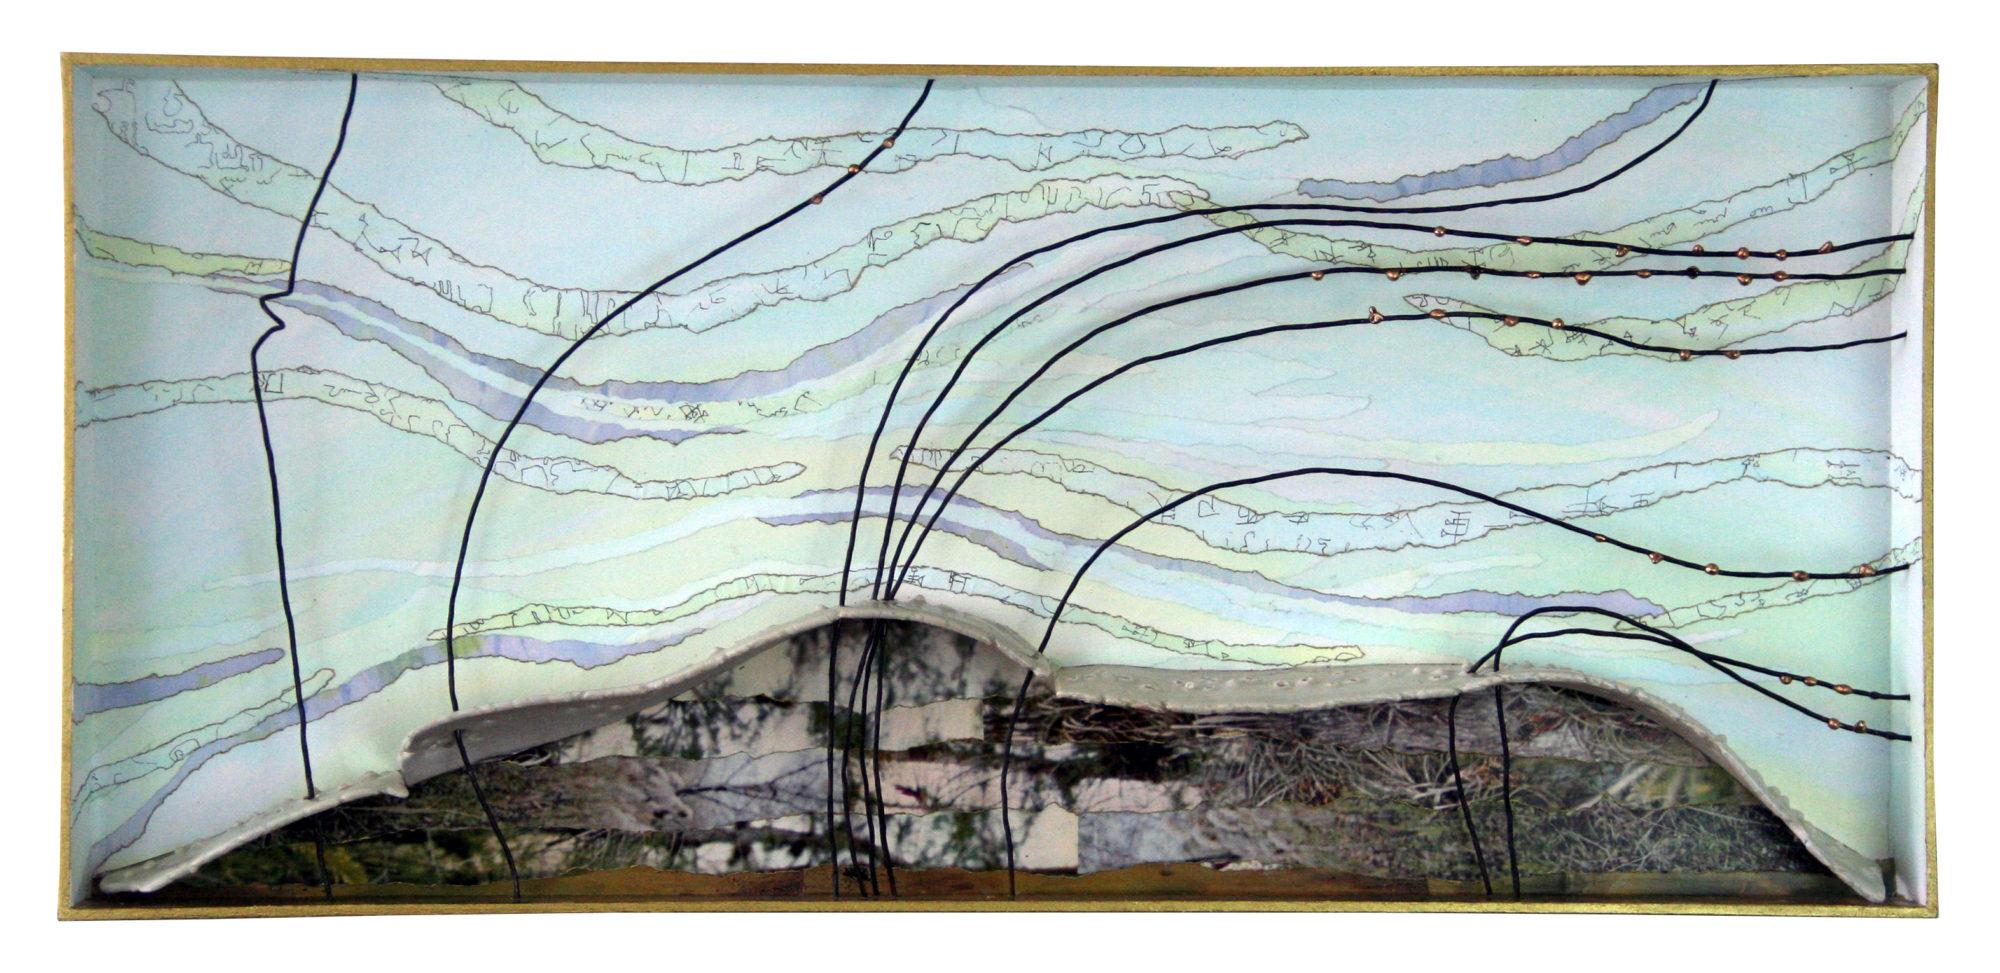 Drifting Through Winter by Ashby Carlisle